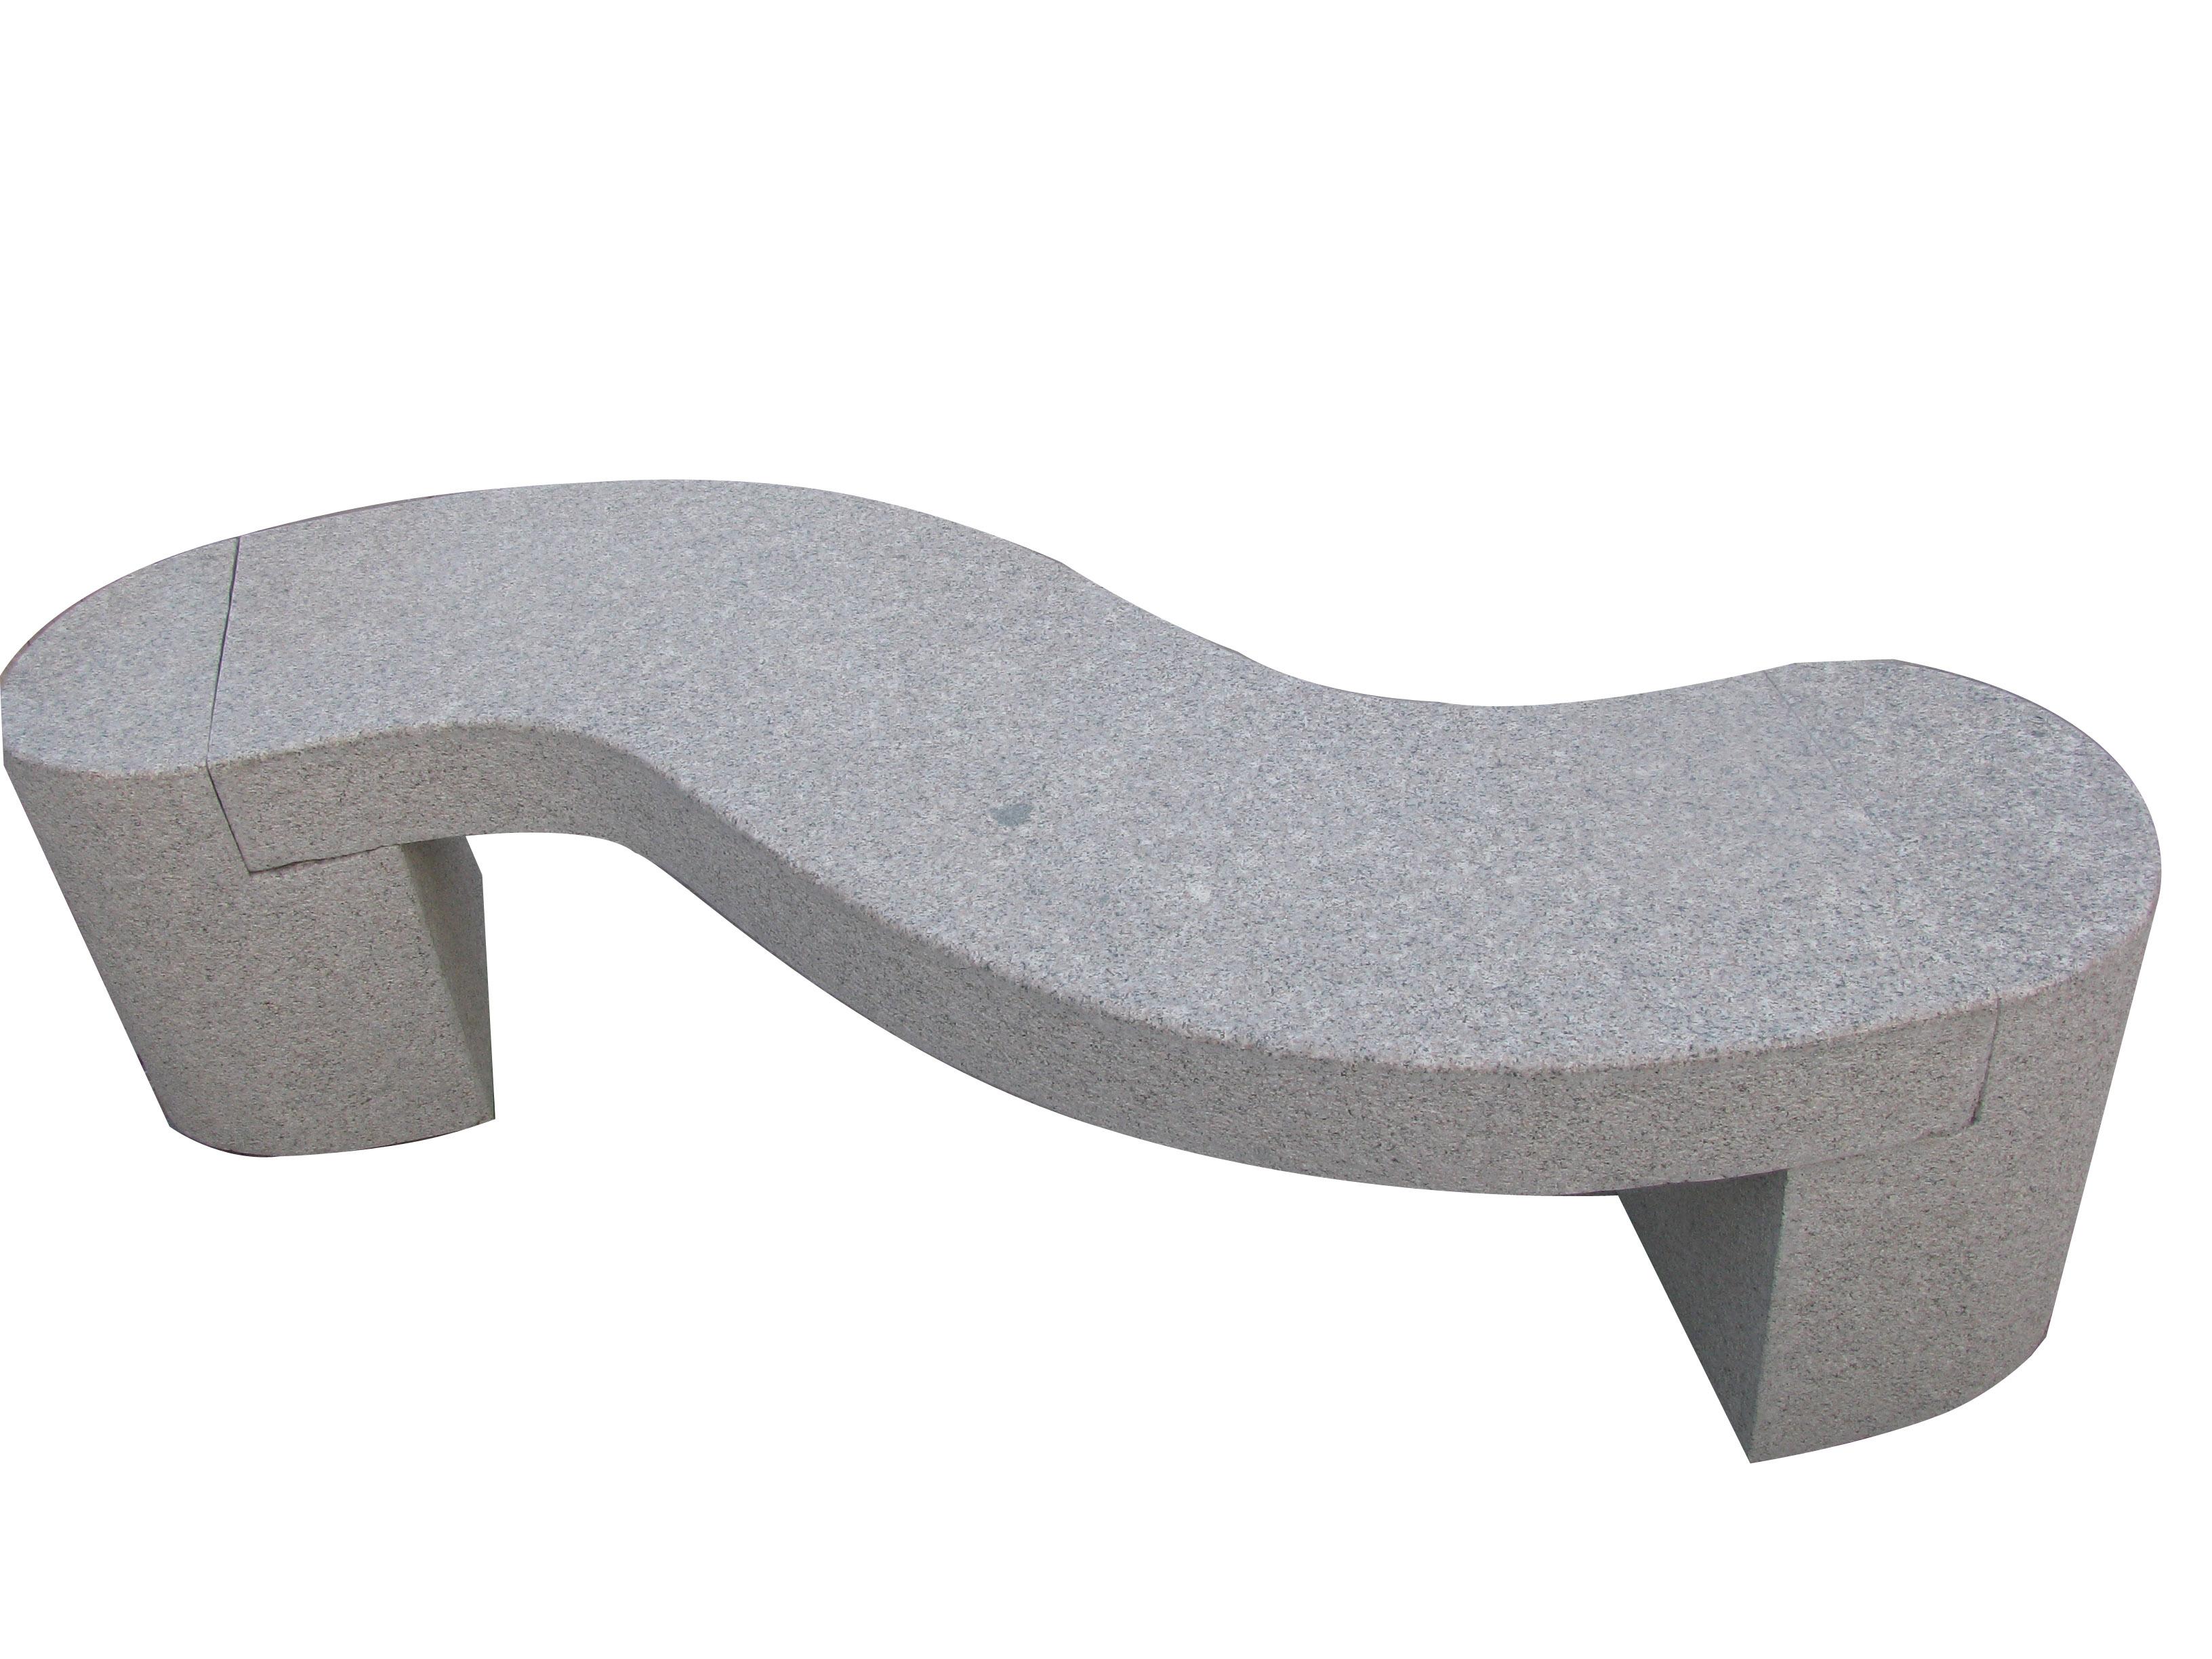 Stone Bench Sculpture